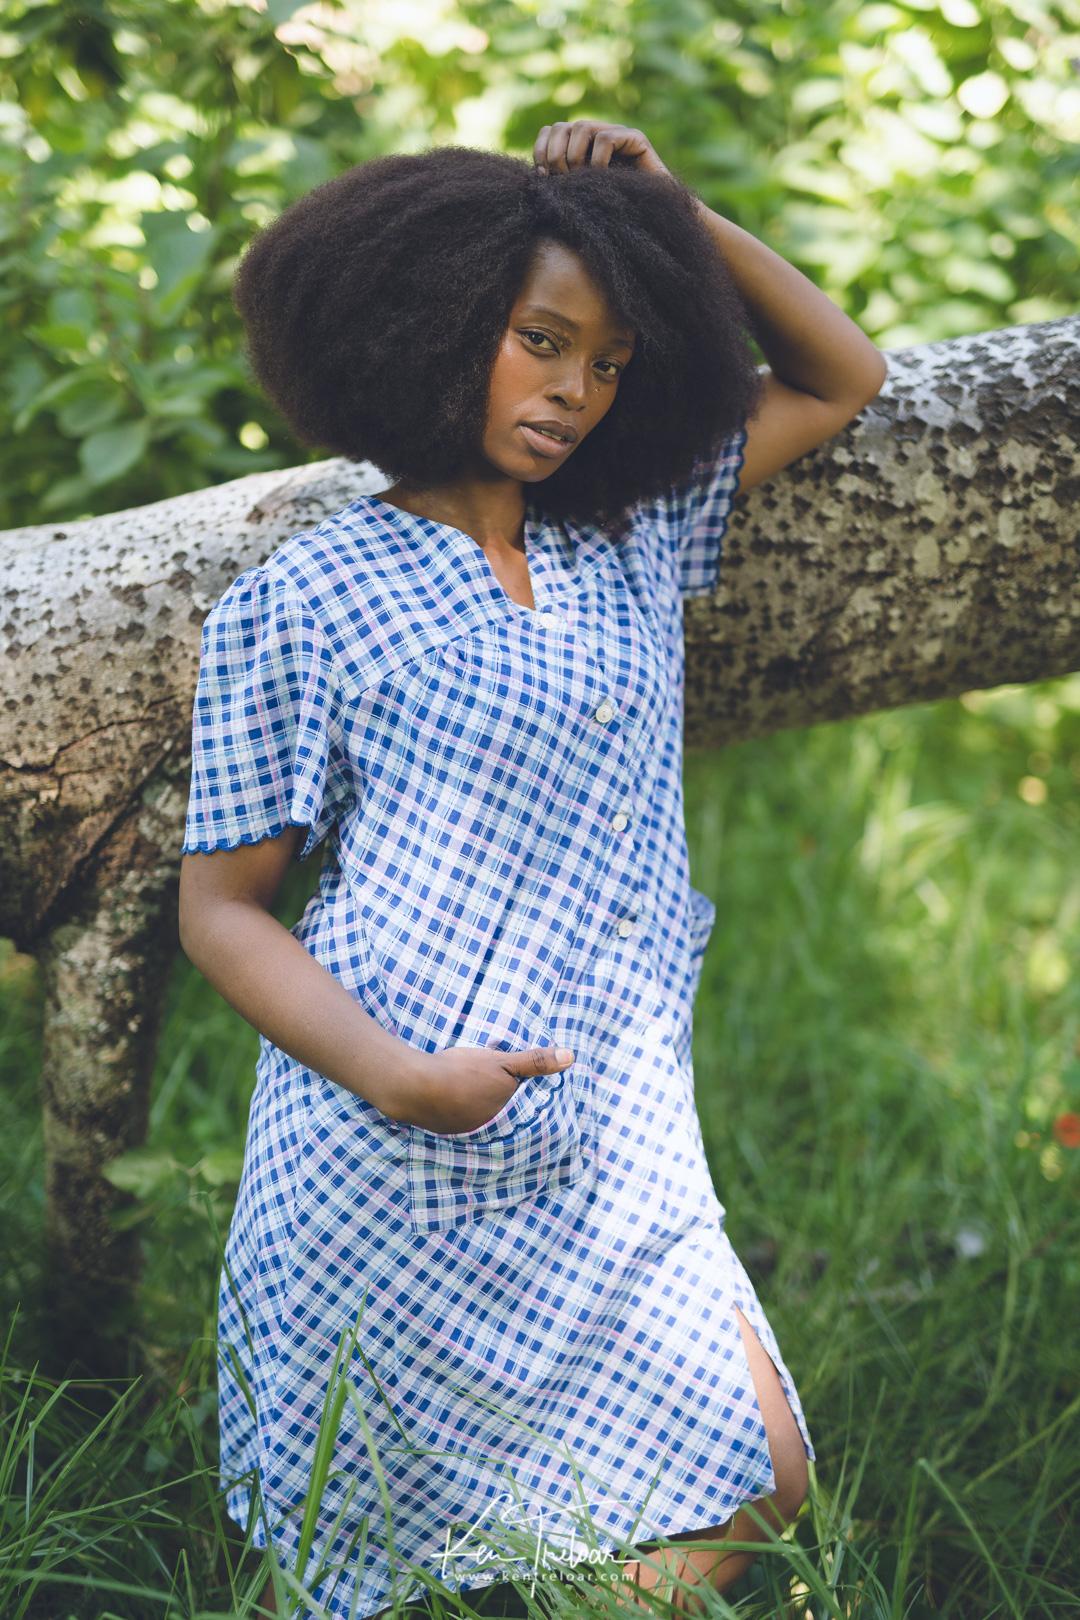 Ken Treloar Photography - Natural L-ight Editorial Portrait Fashion Photo Session - Cape Town Dec 2018-22.jpg